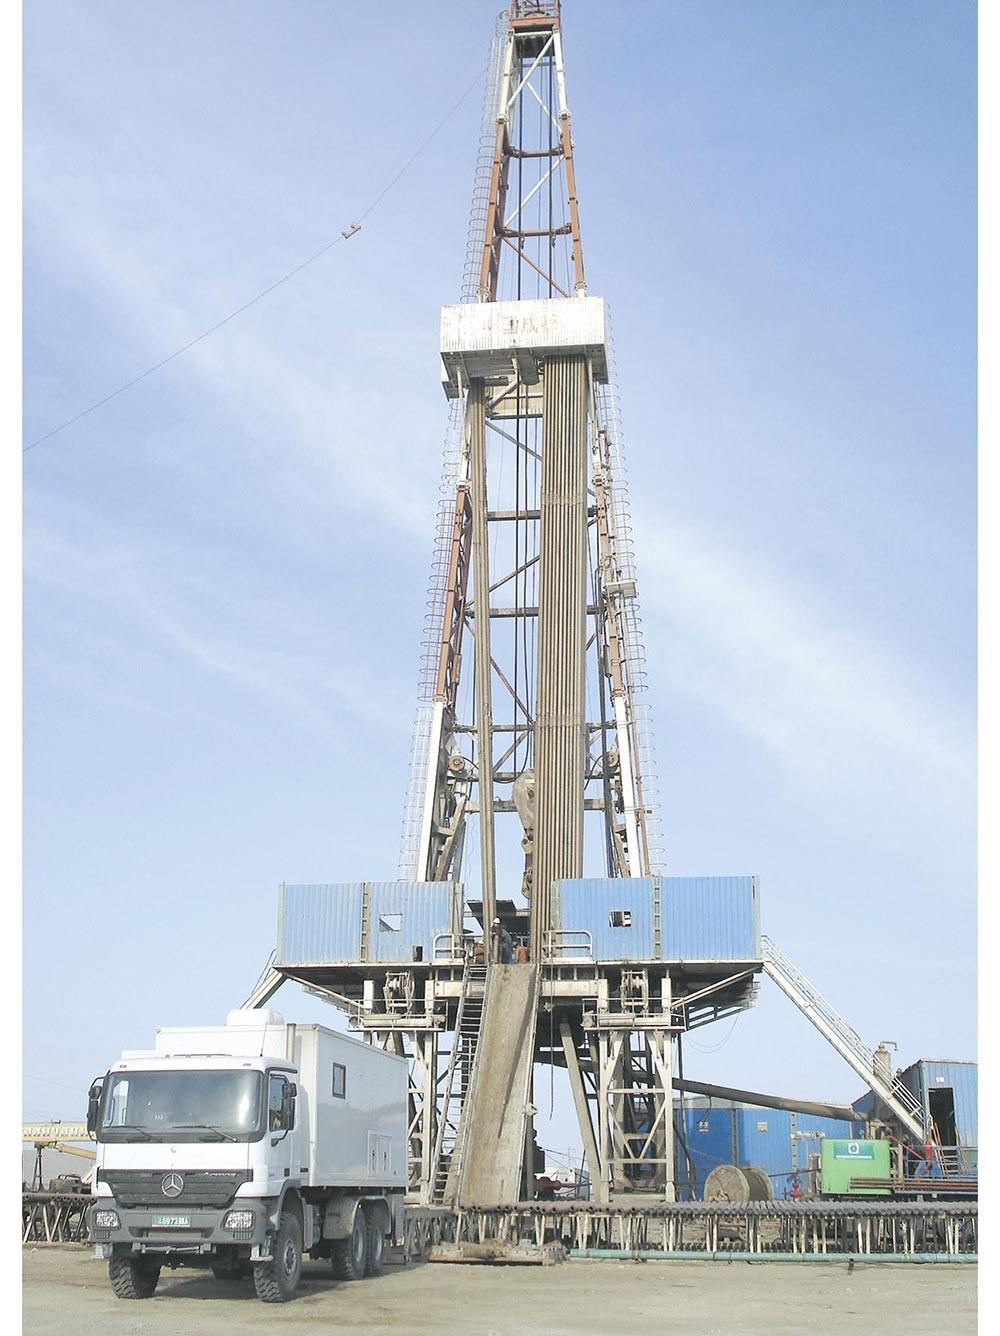 https://oilgas.gov.tm/storage/posts/2784/original-161248e16bcf6f.jpeg